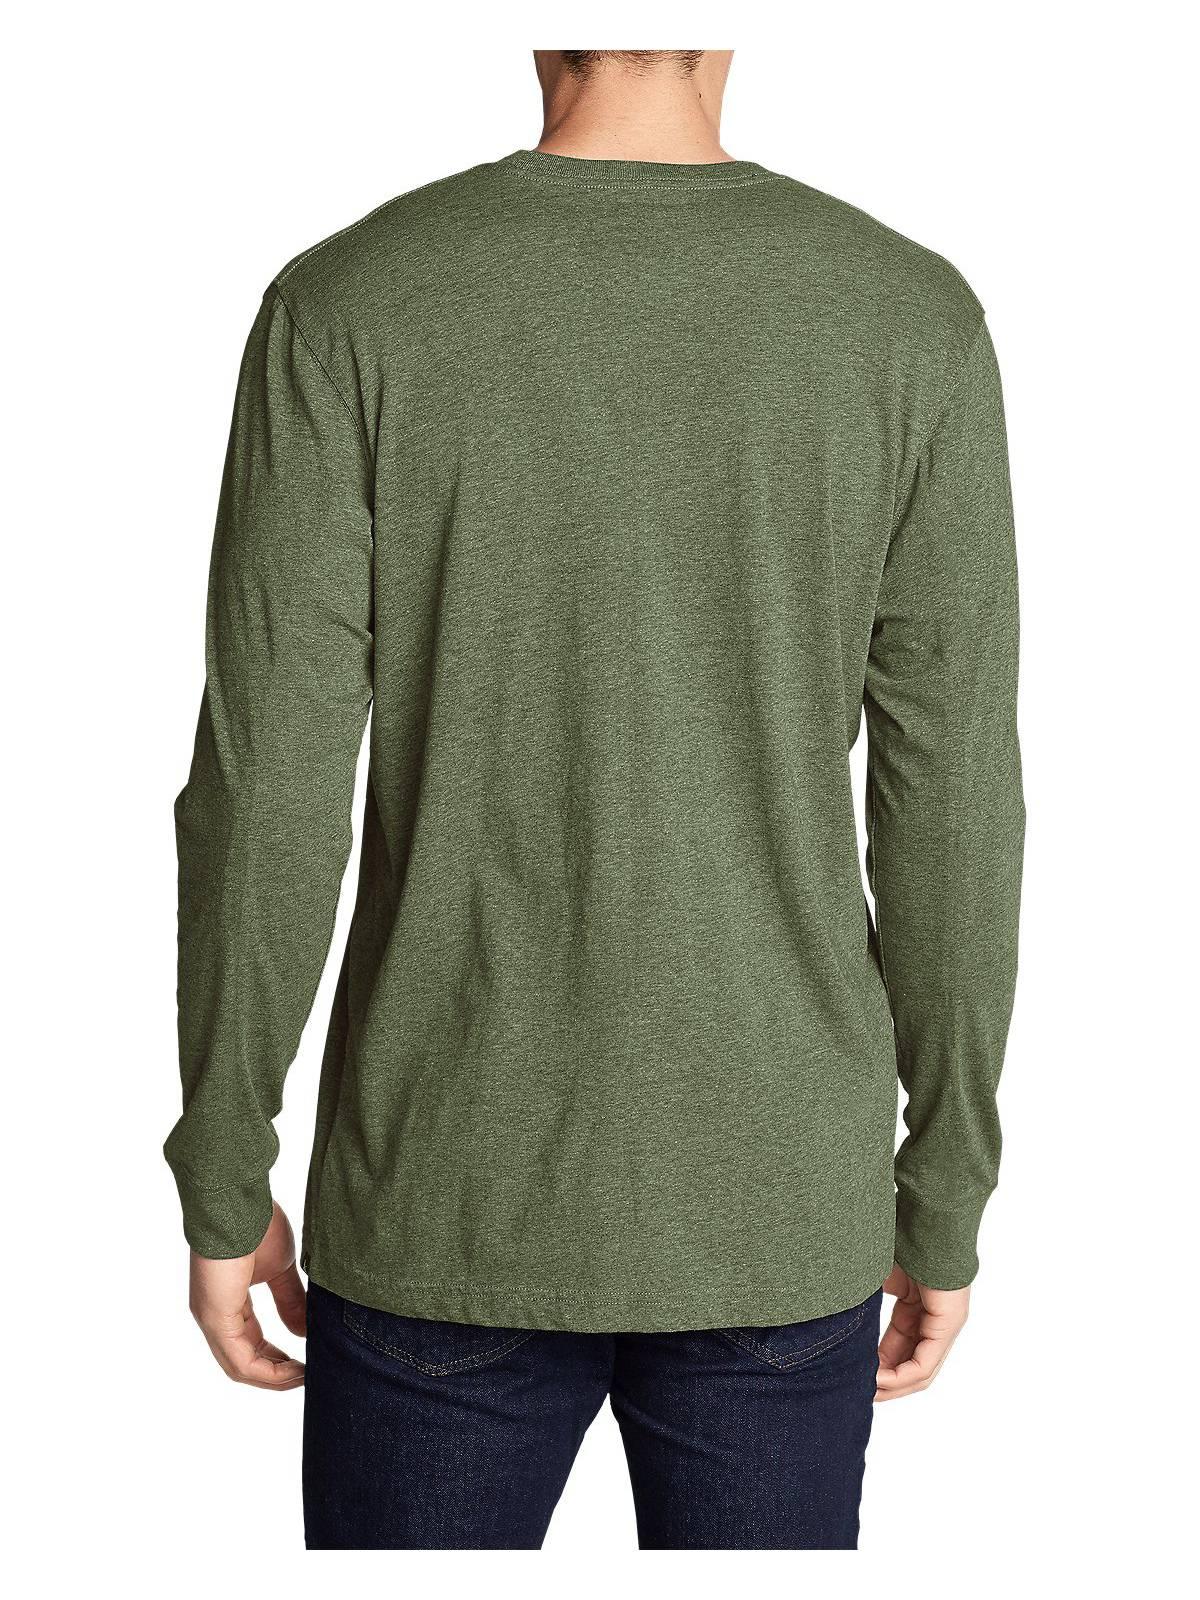 05308e8ad Hanes Long Sleeve T Shirts Walmart - Nils Stucki Kieferorthopäde